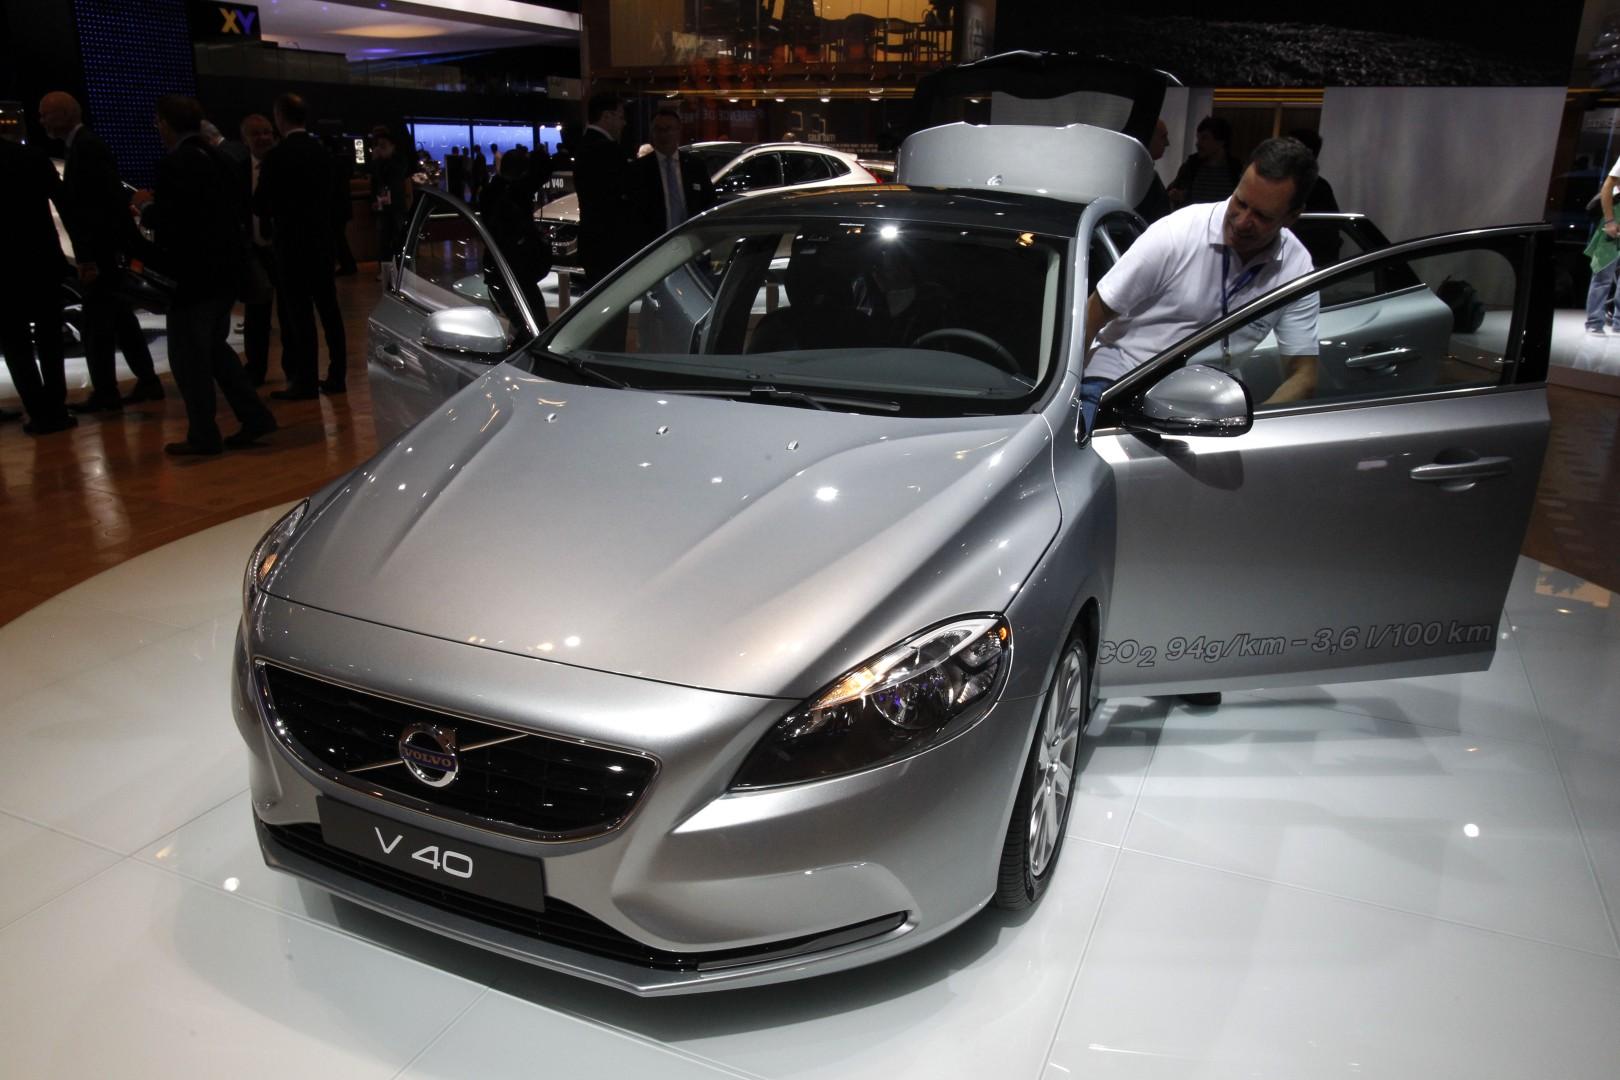 Spiksplinternieuw Volvo returns to 'safety first' marketing strategy | South China MP-68